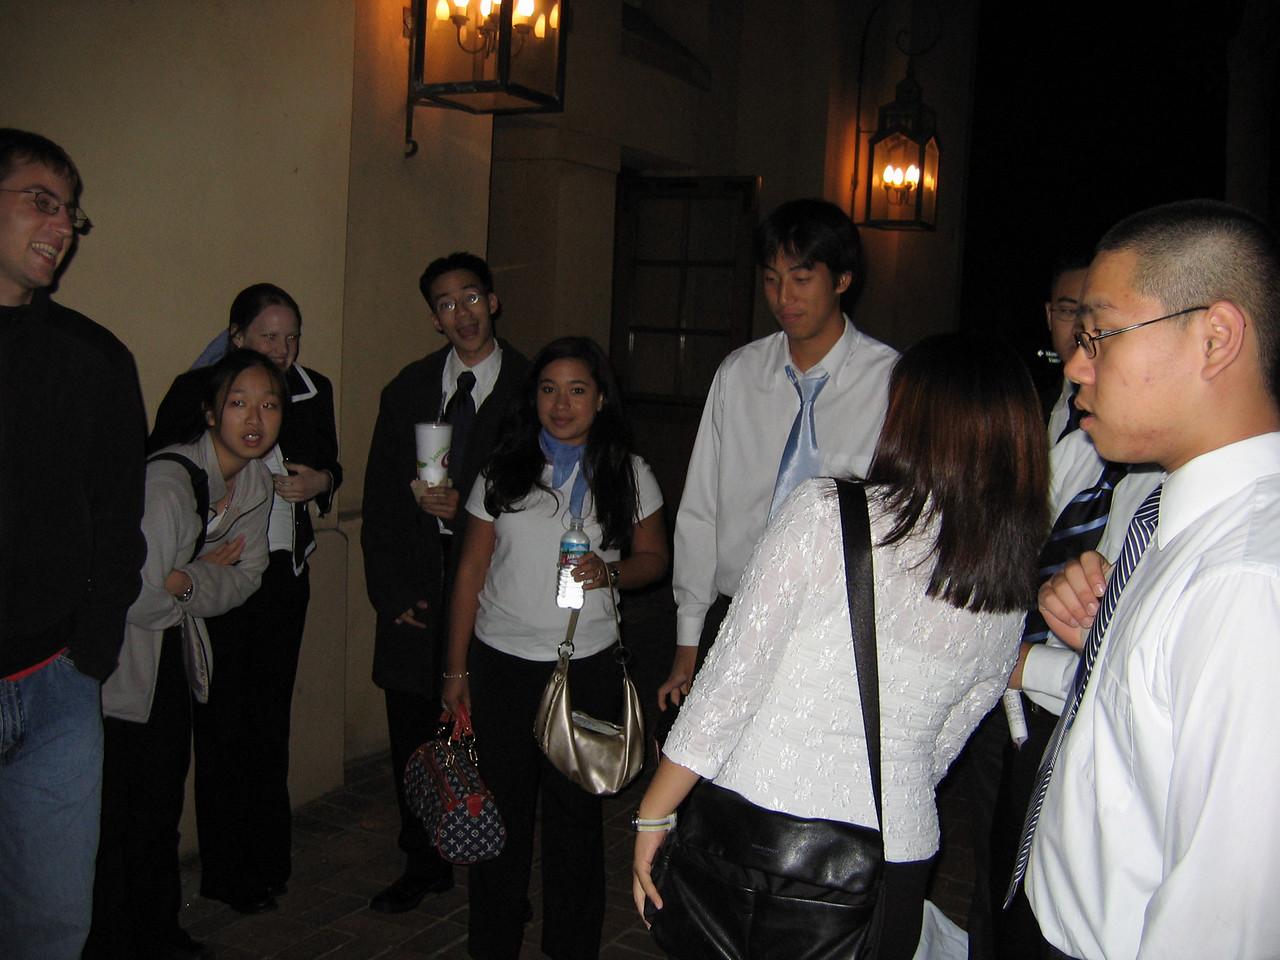 2005 10 22 Sat - Group pic outside Mem Aud 1